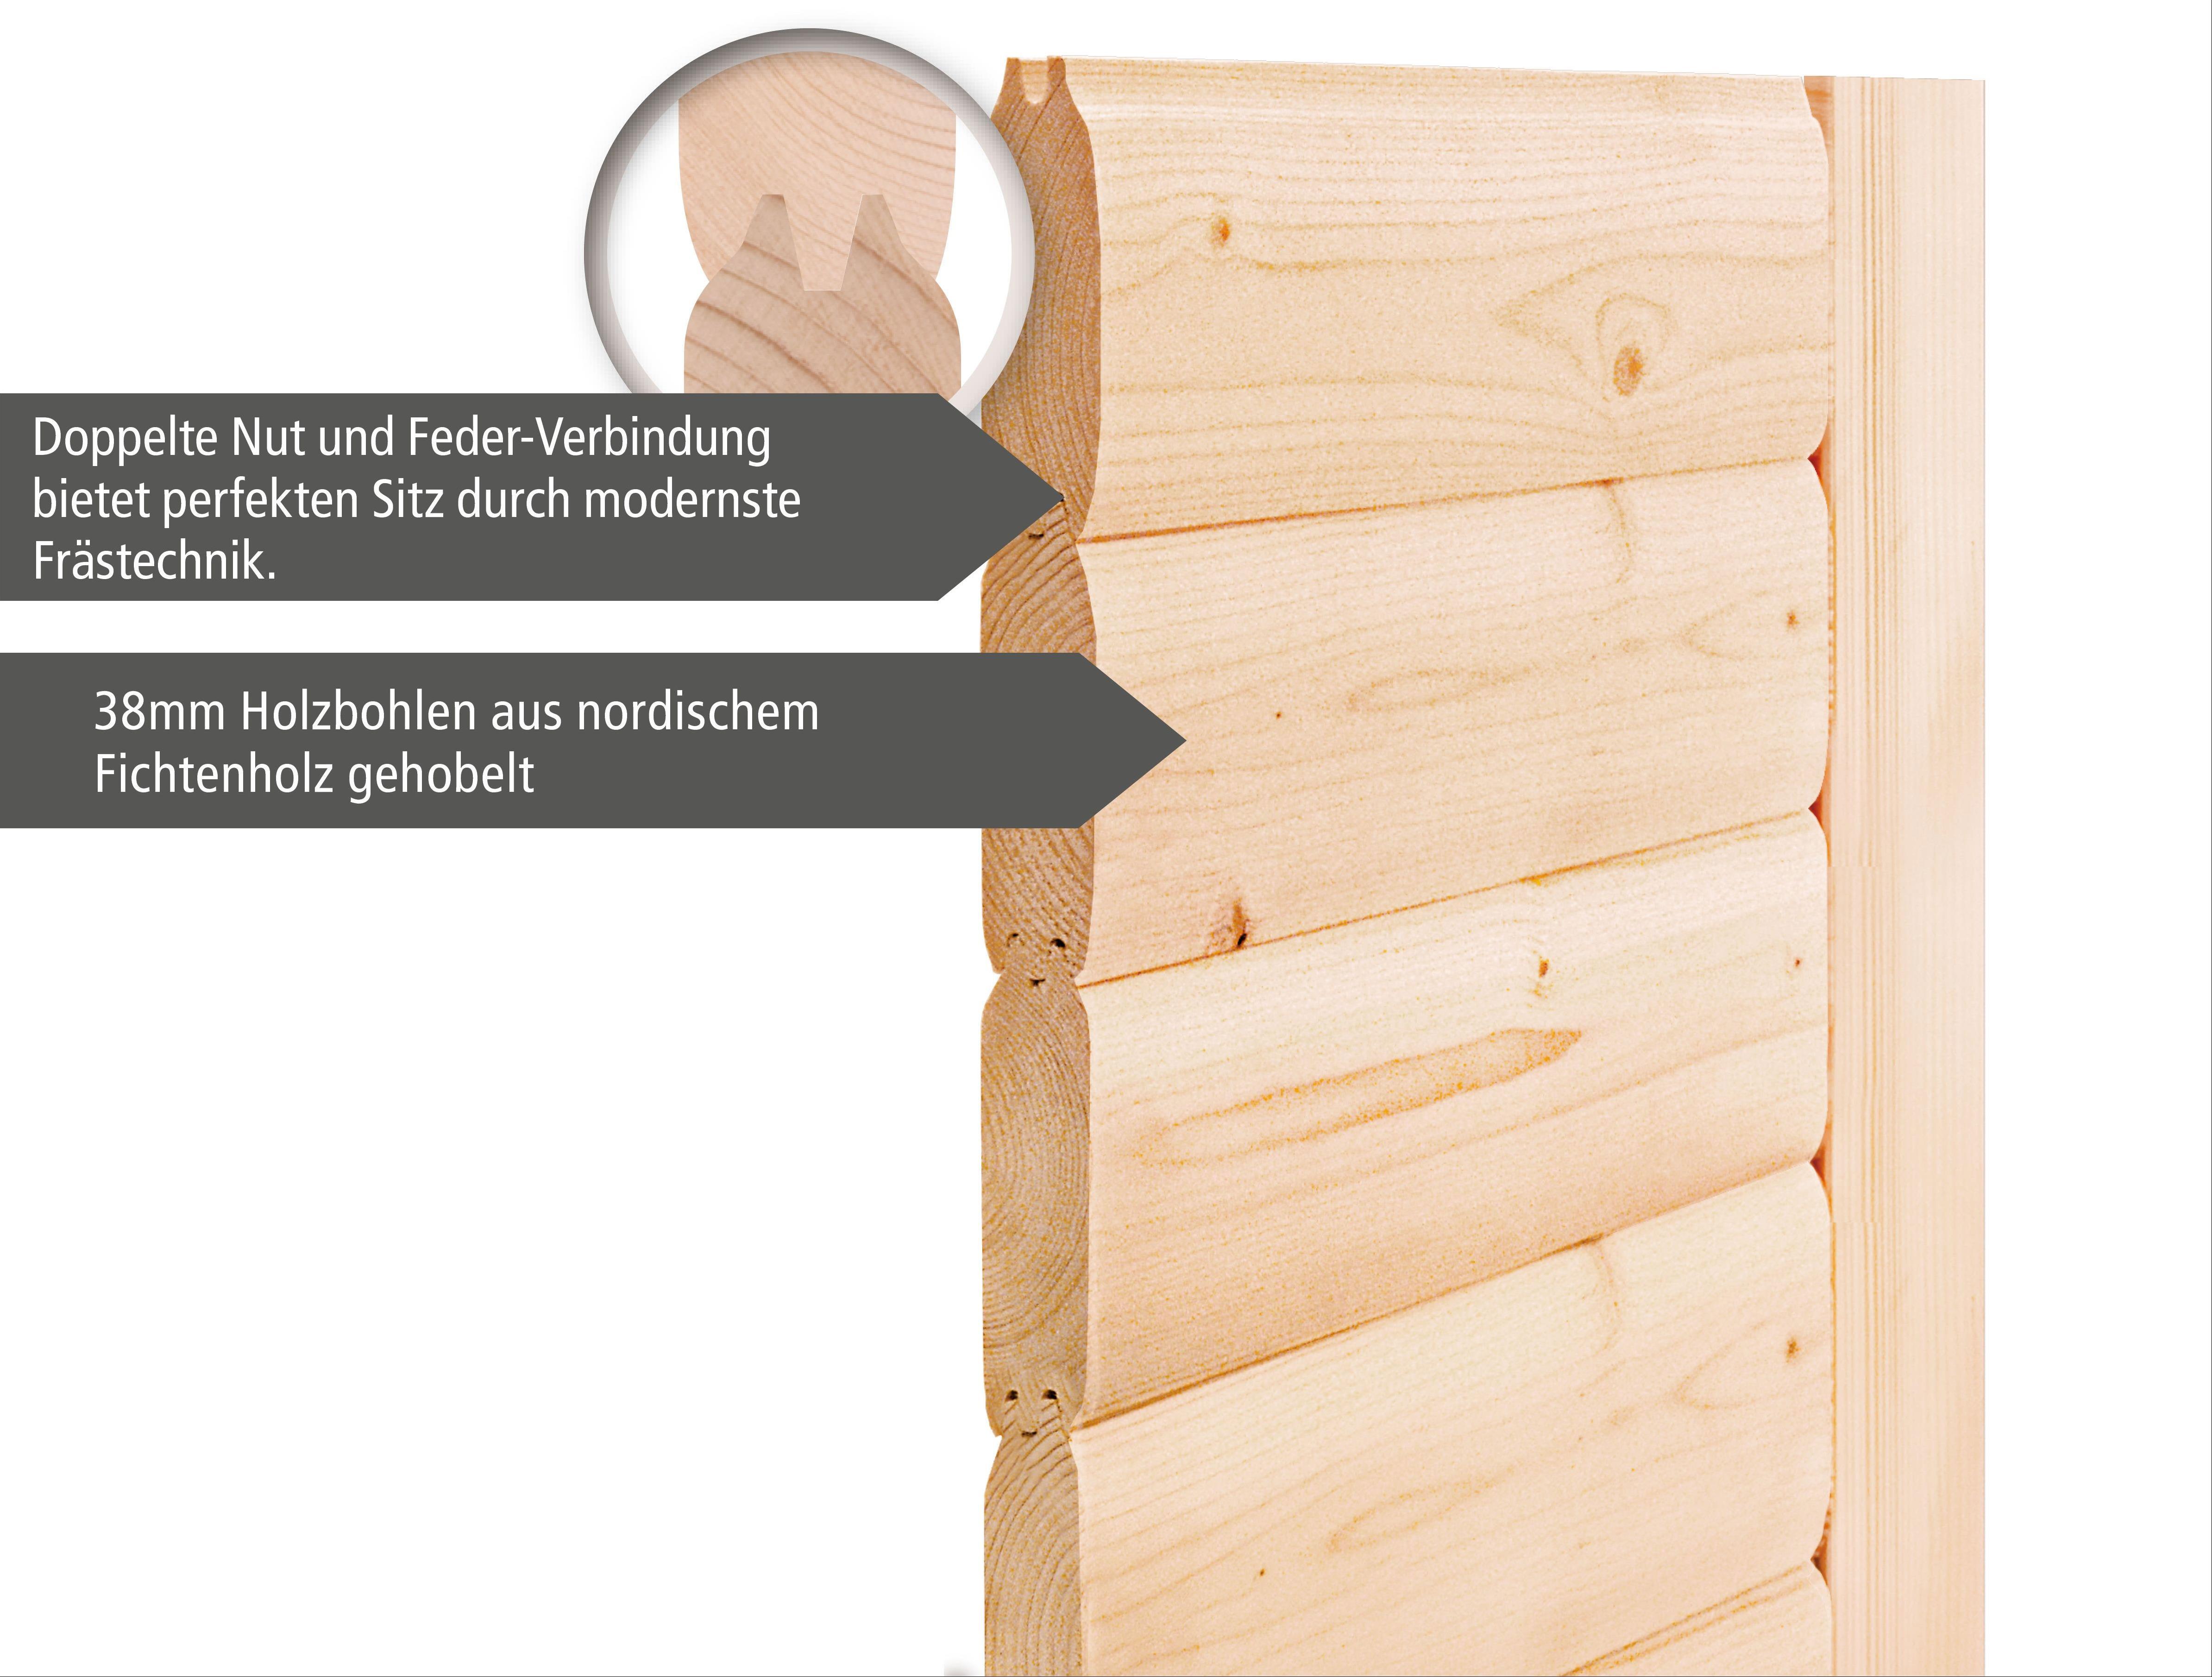 WoodFeeling Sauna Mia 38mm Saunaofen 9kW intern Holztür Bild 5